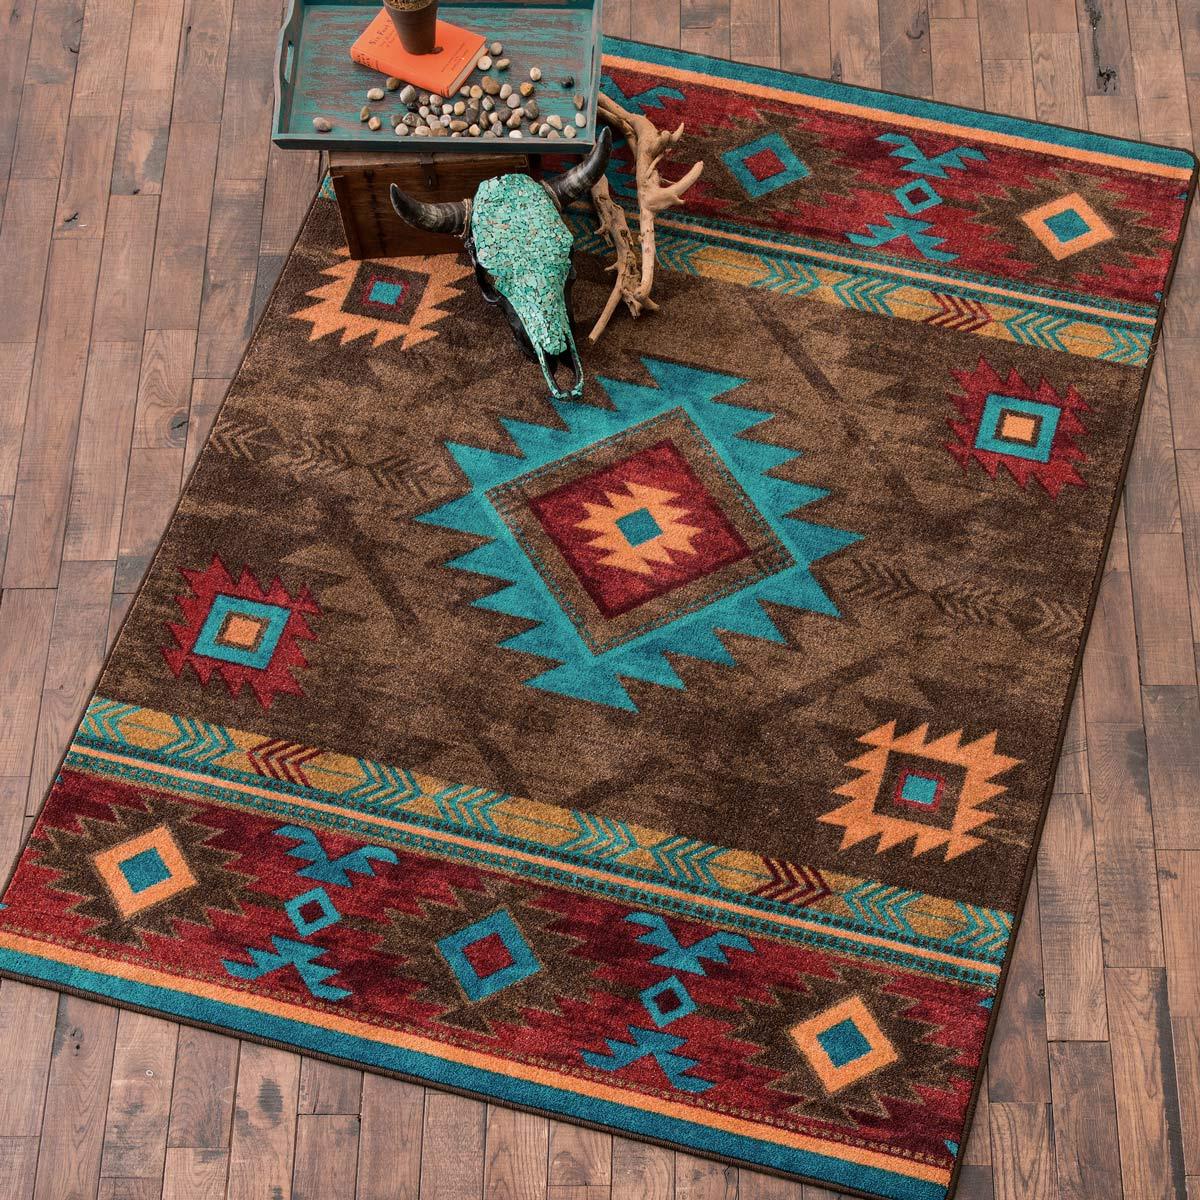 southwestern rugs southwest rugs: 3 x 4 whiskey river turquoise rug|lone star western decor NIFLDDV